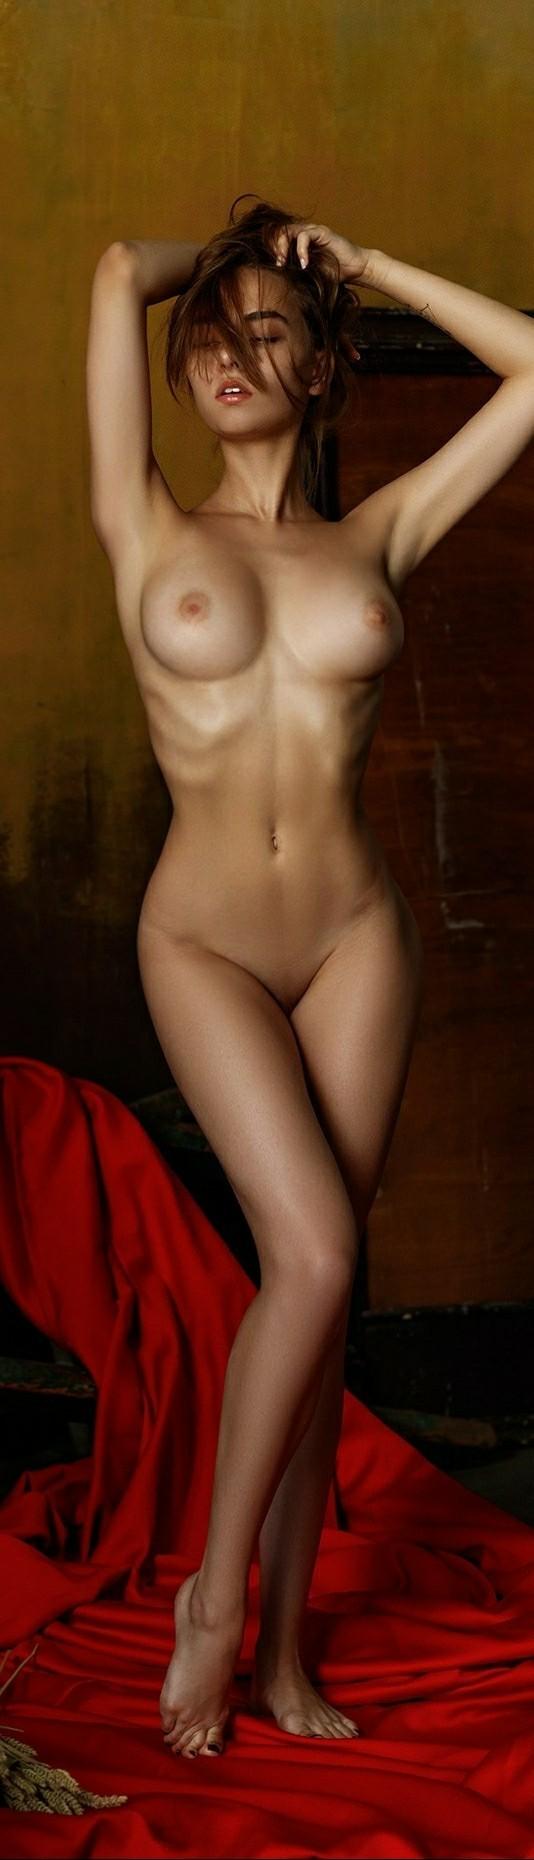 Красота голой девушки